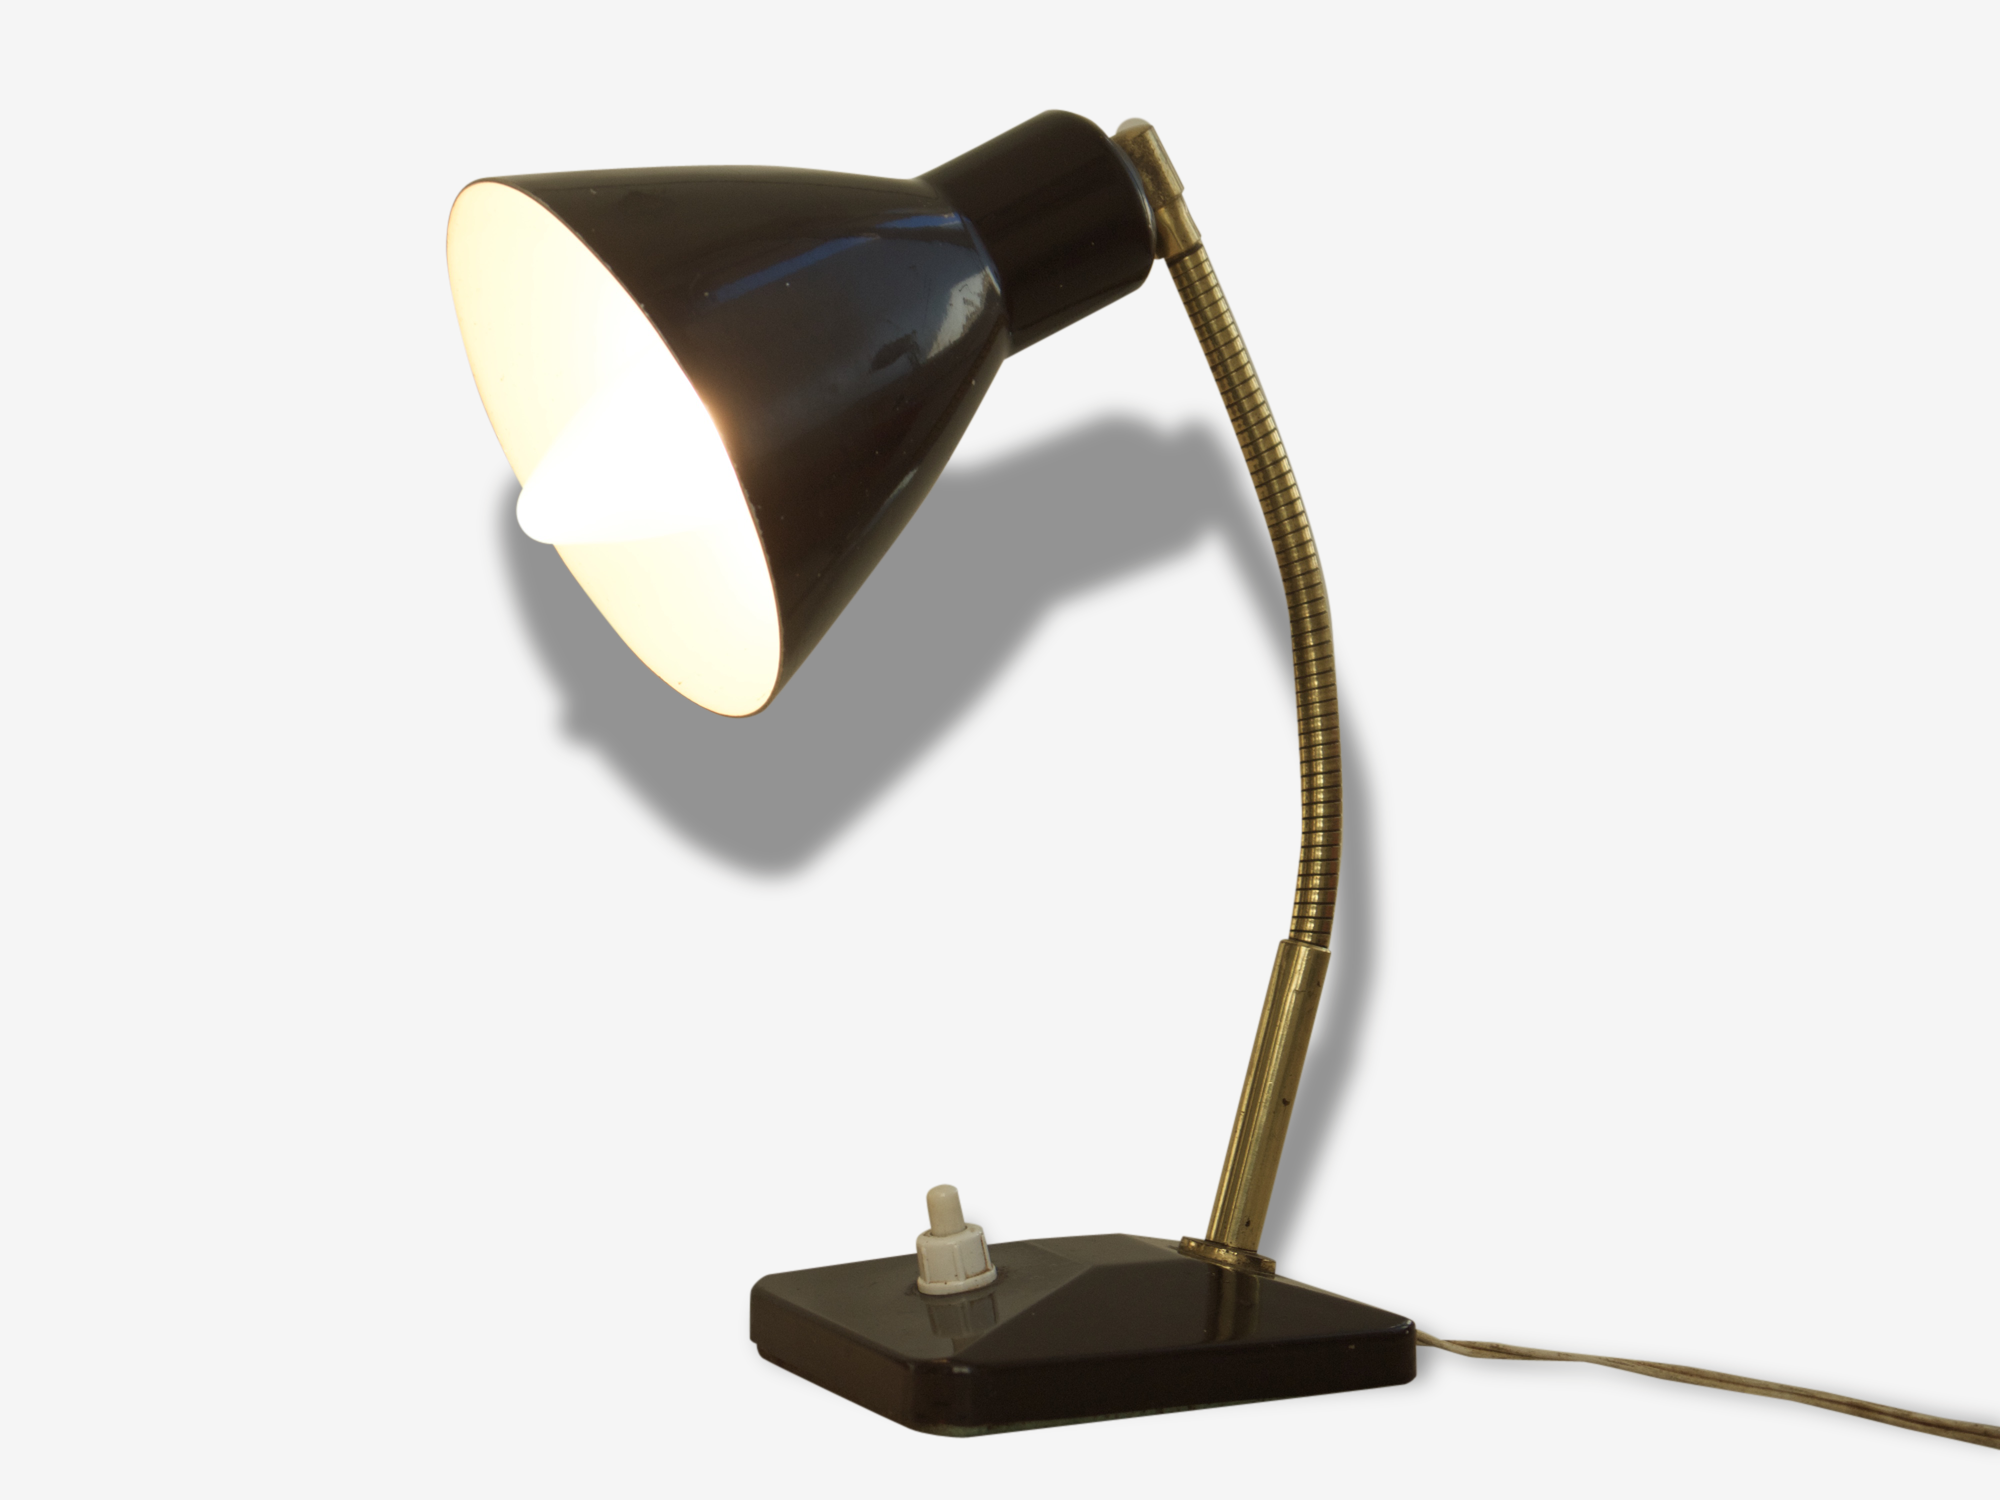 Lampe De Chevet Applique Flexible Vintage Fabrication Aluminor